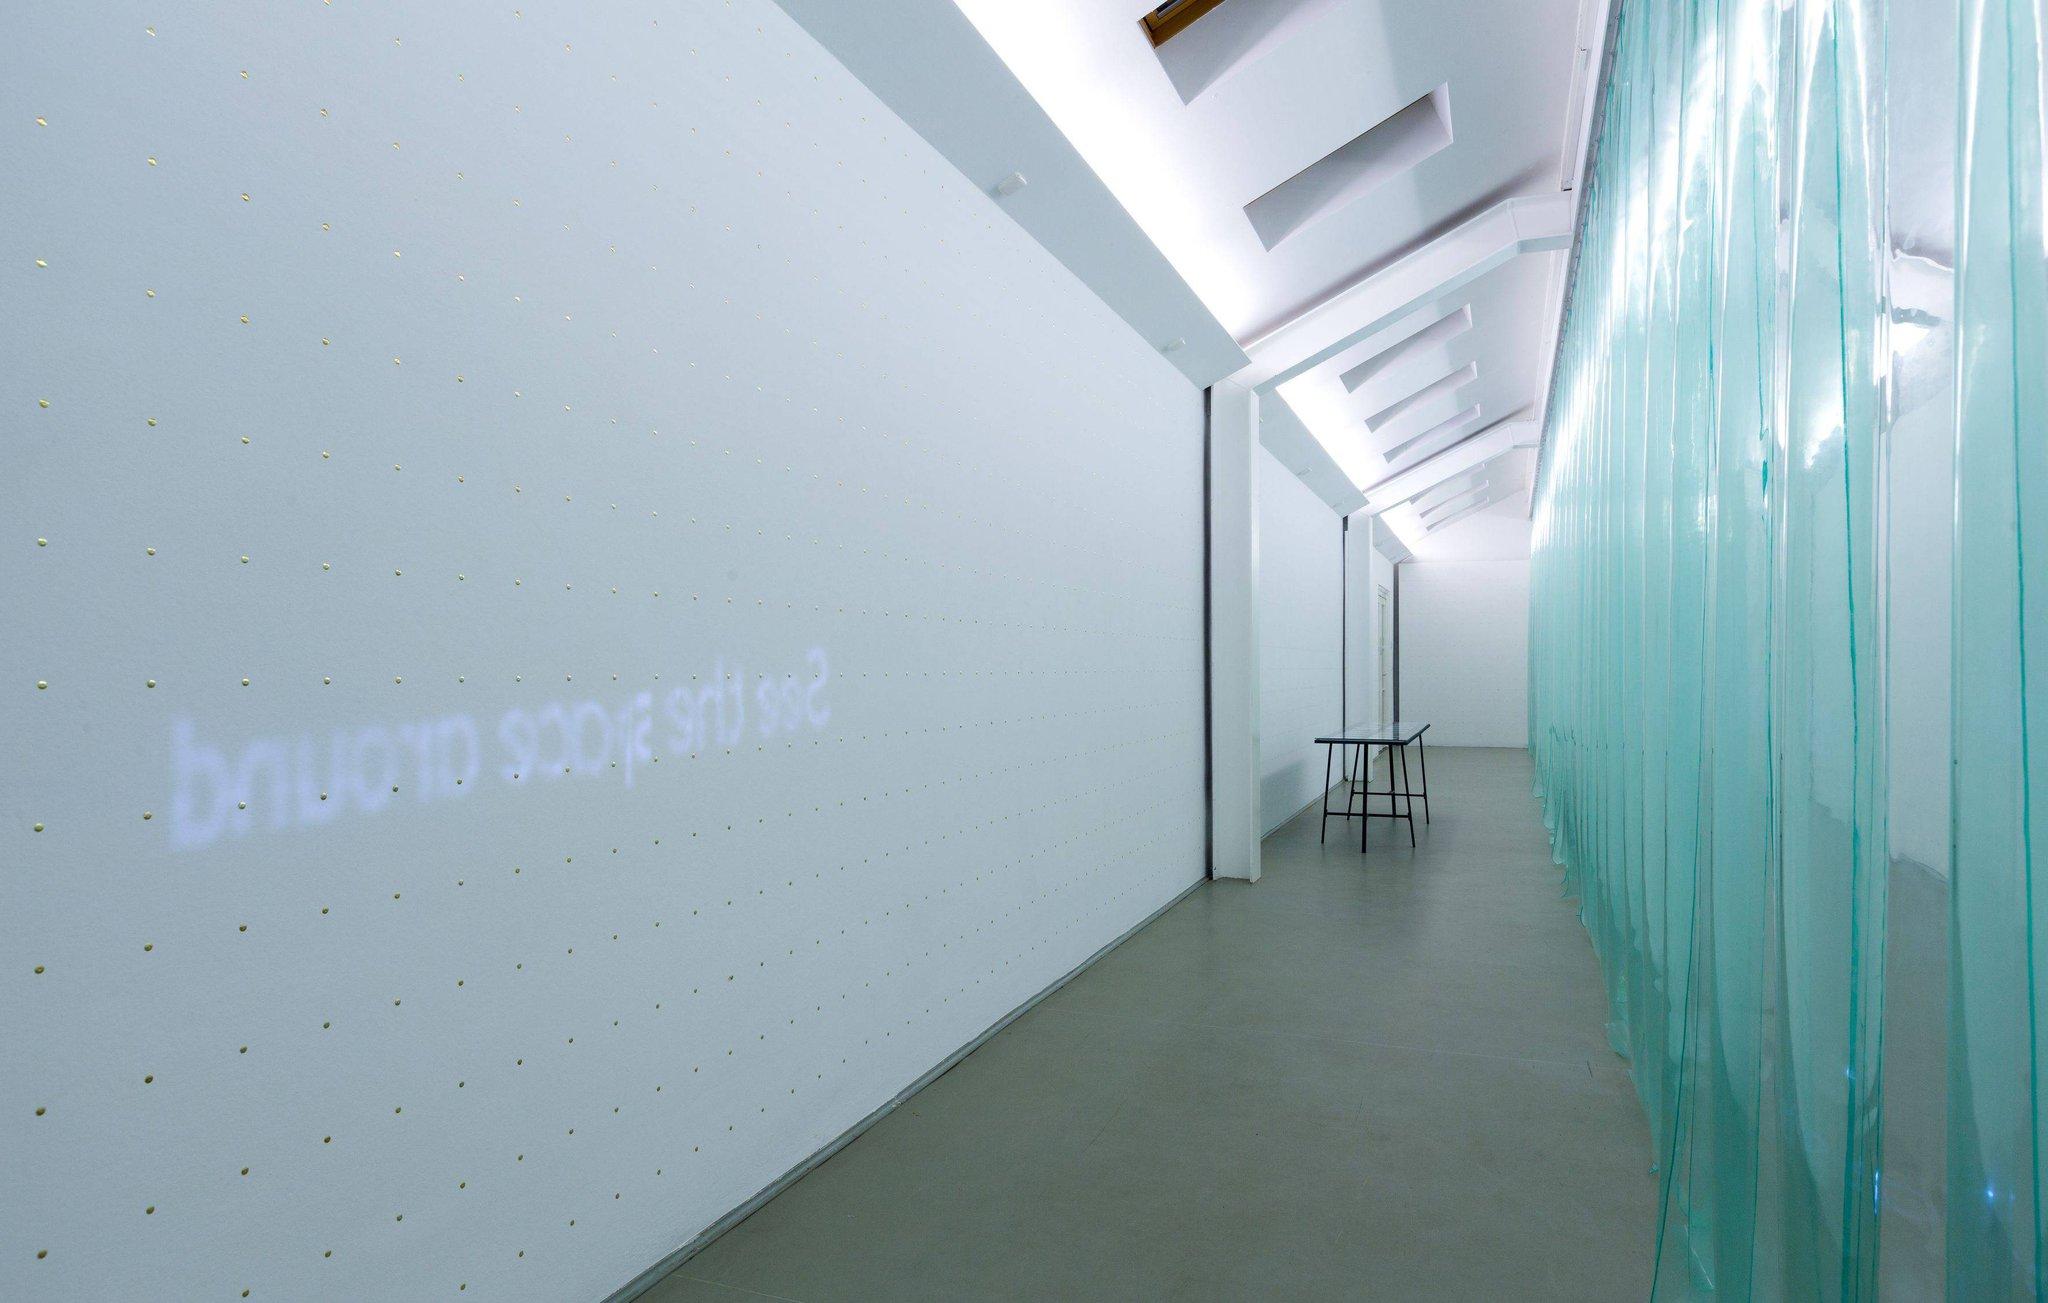 schneller kurs vintage interieur design, https://www.kreiszeitung.de/kultur/fliehen-darf-entscheidet-staat, Design ideen